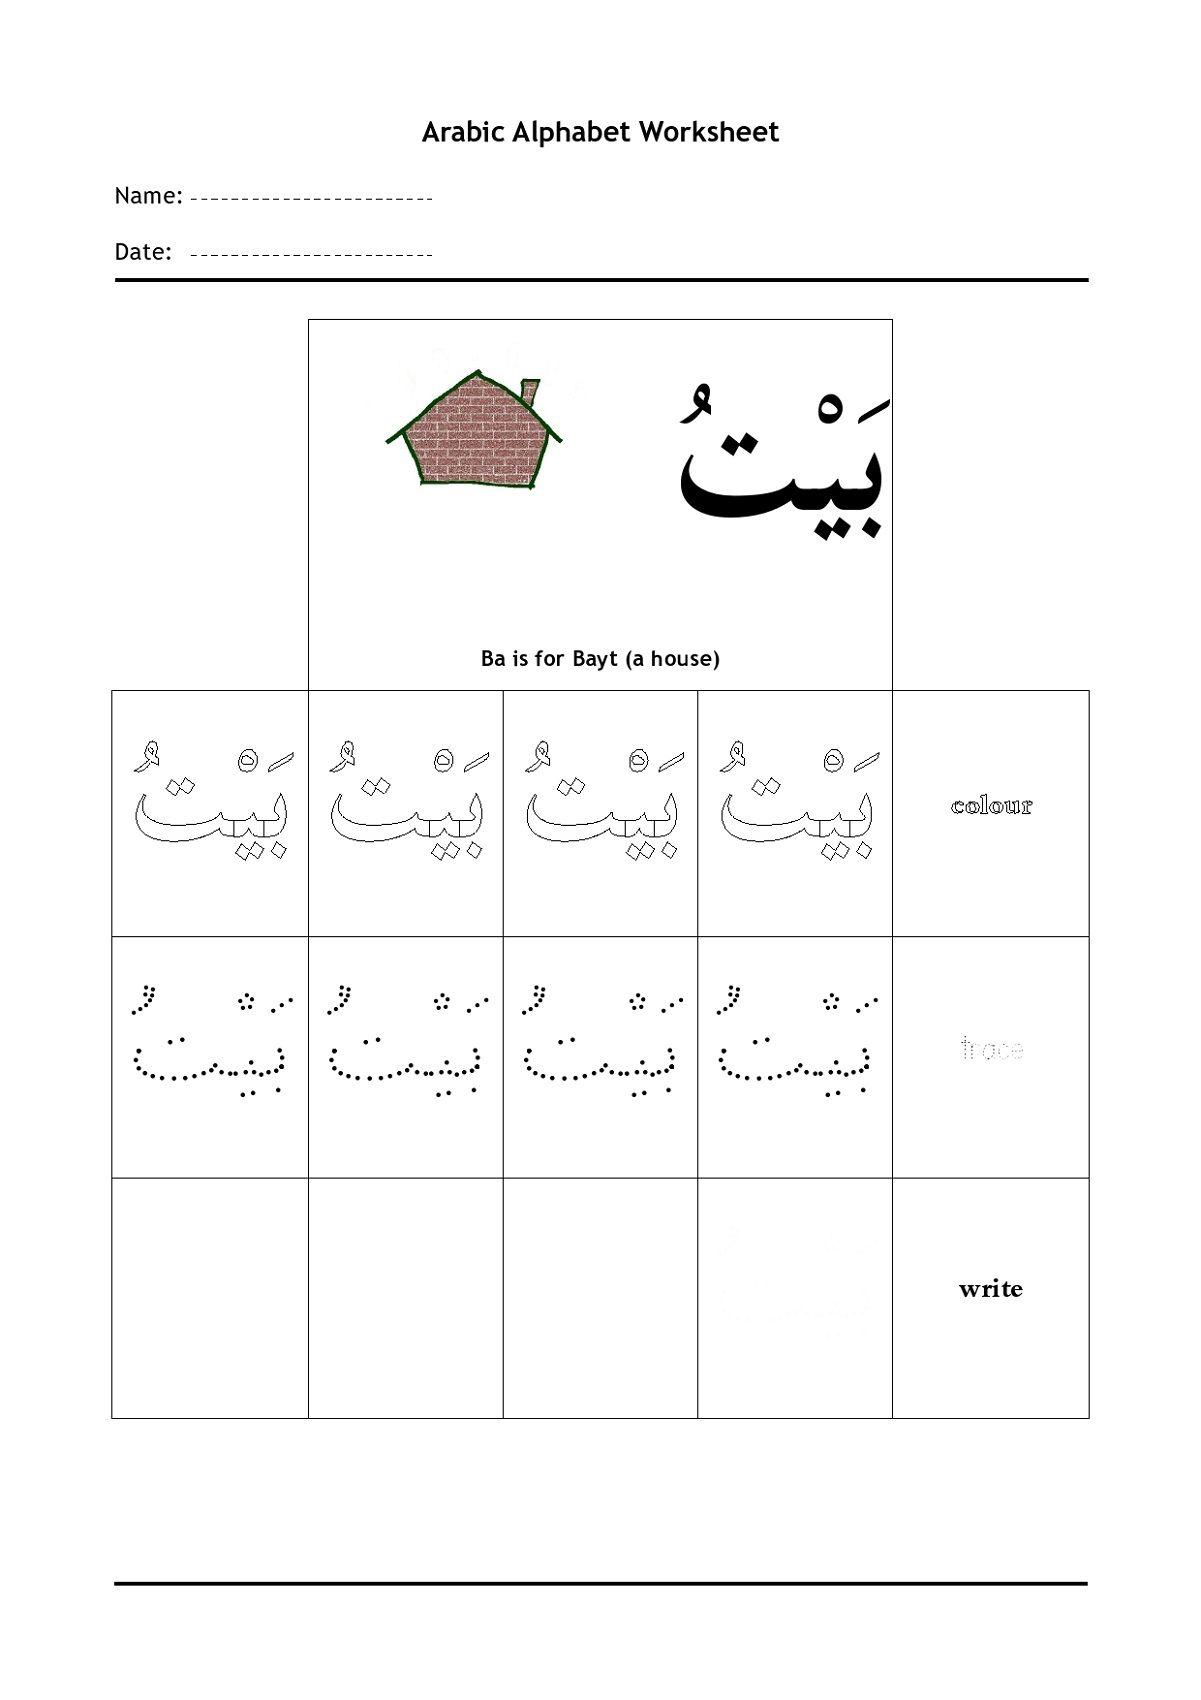 Arabic Alphabet Worksheets For Arabic Language Learning